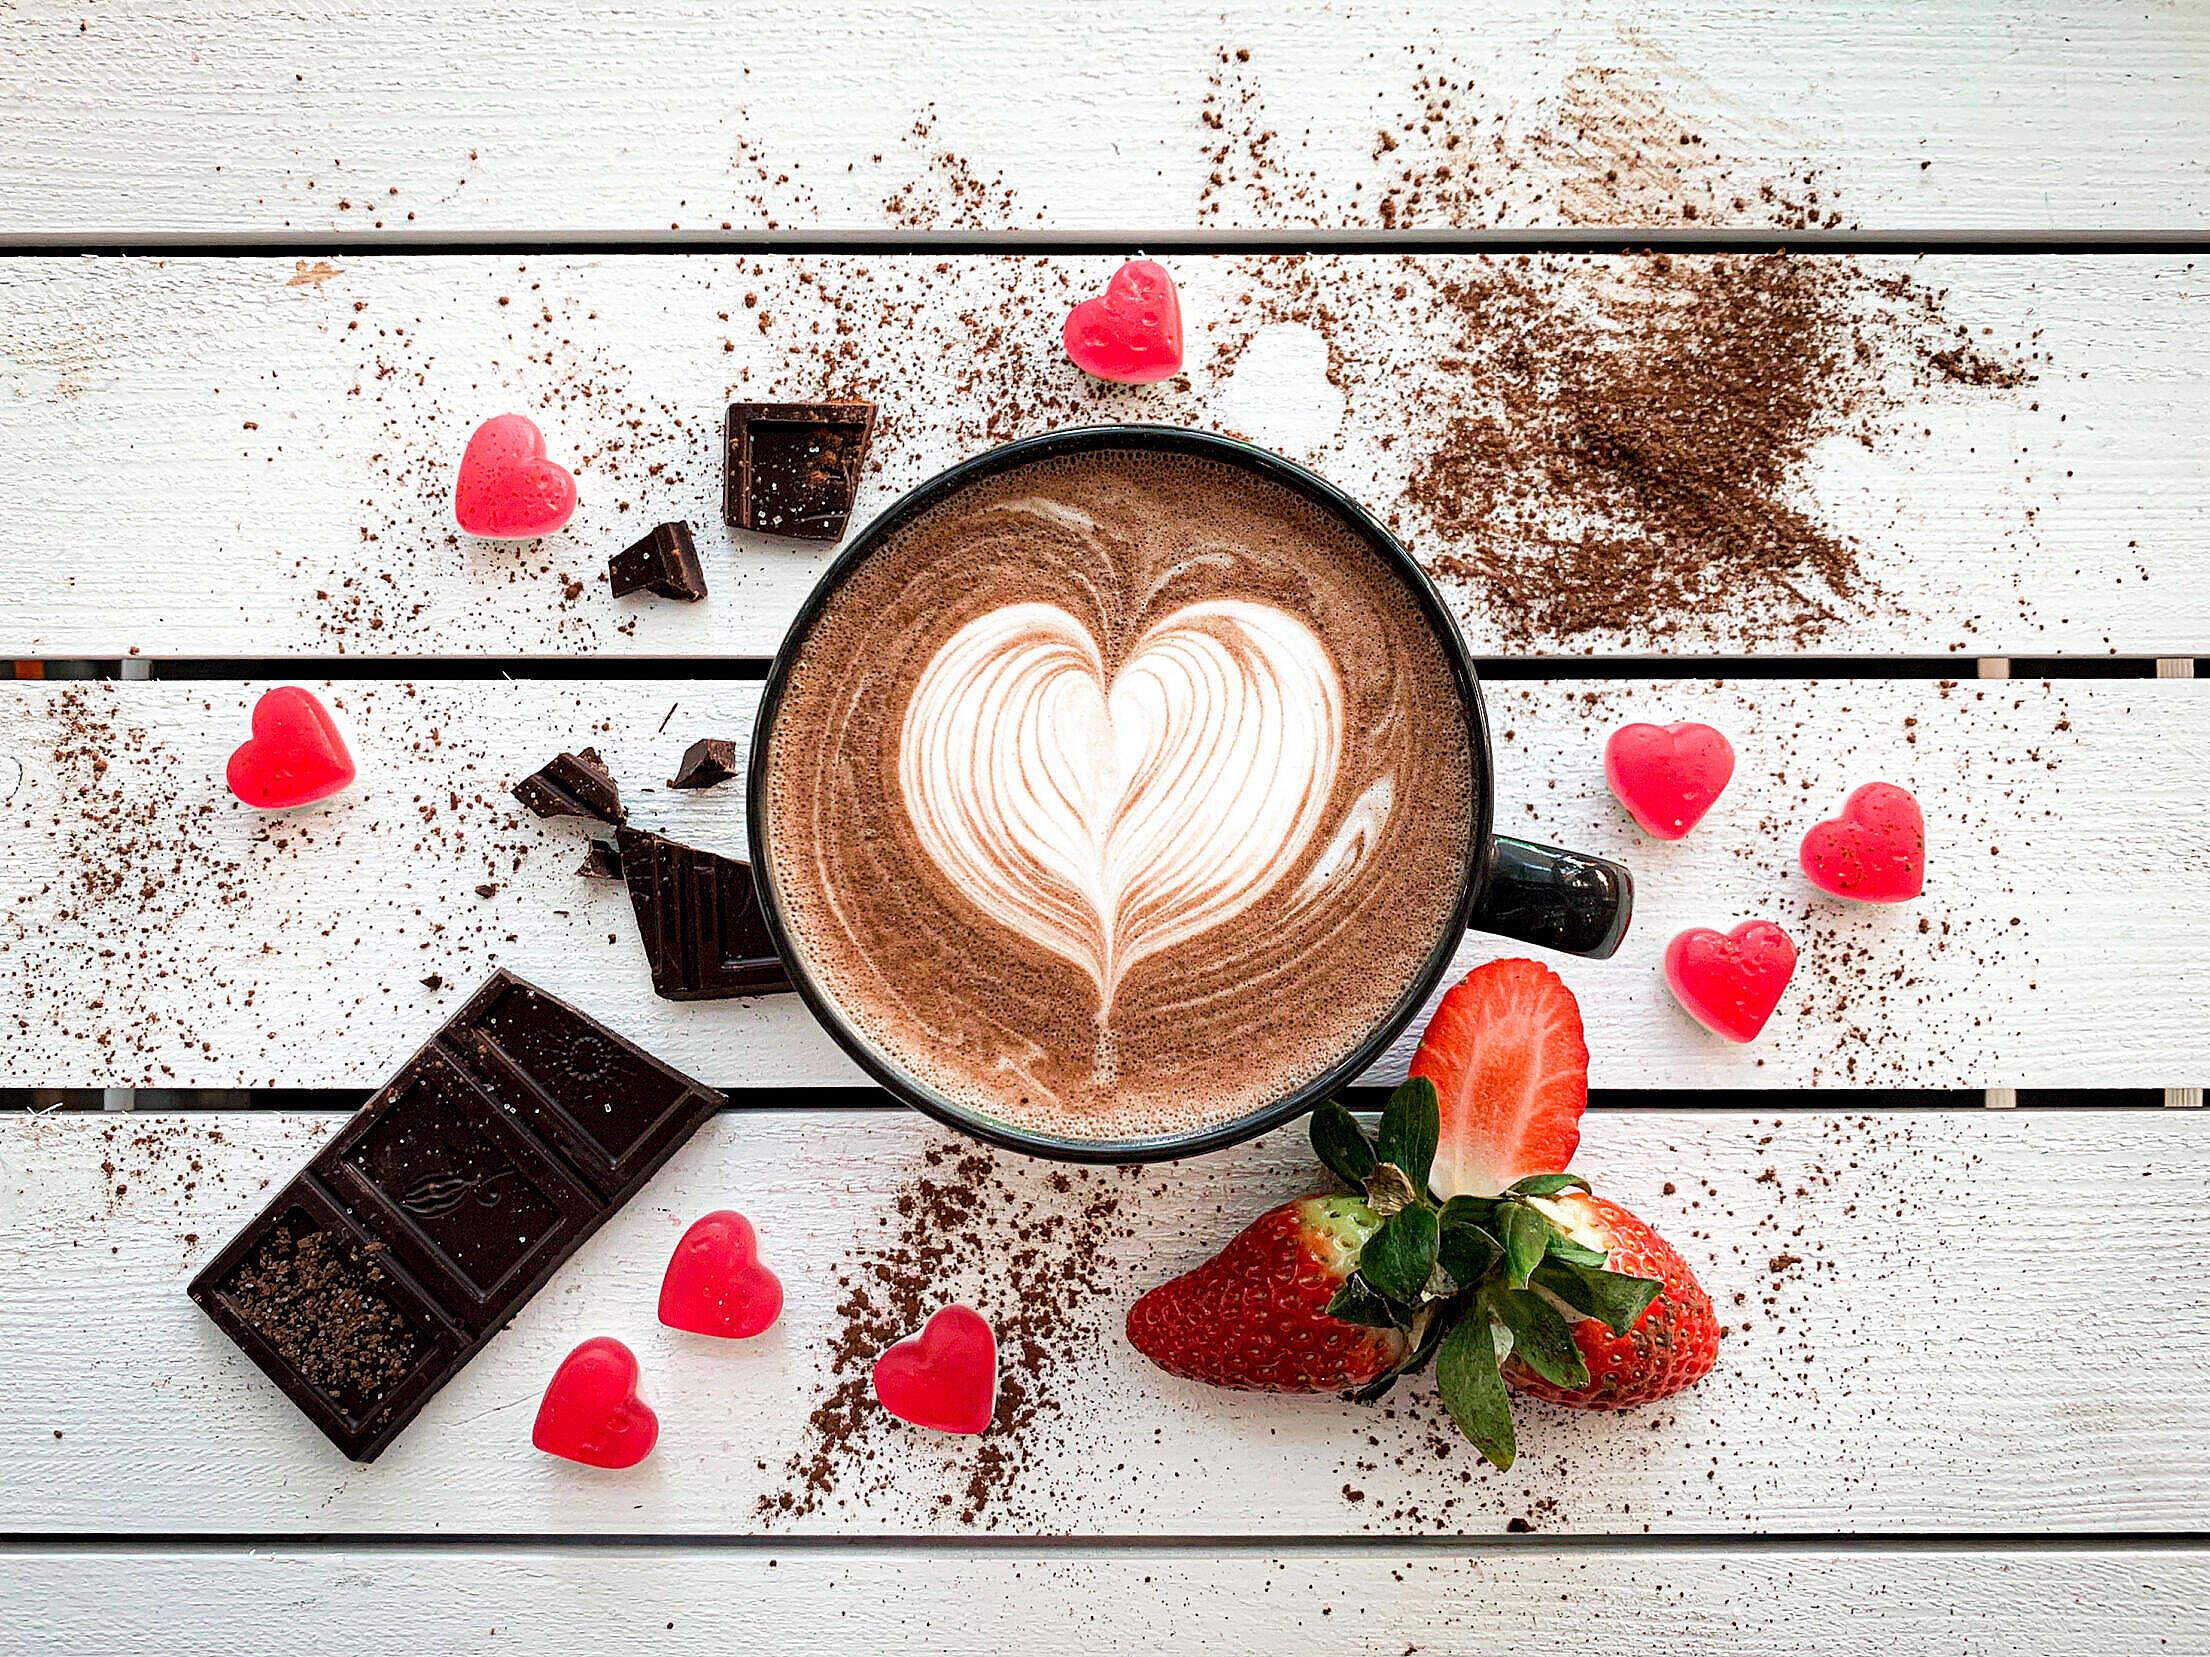 Strawberry Caffè Mocha with Latte Art Free Stock Photo